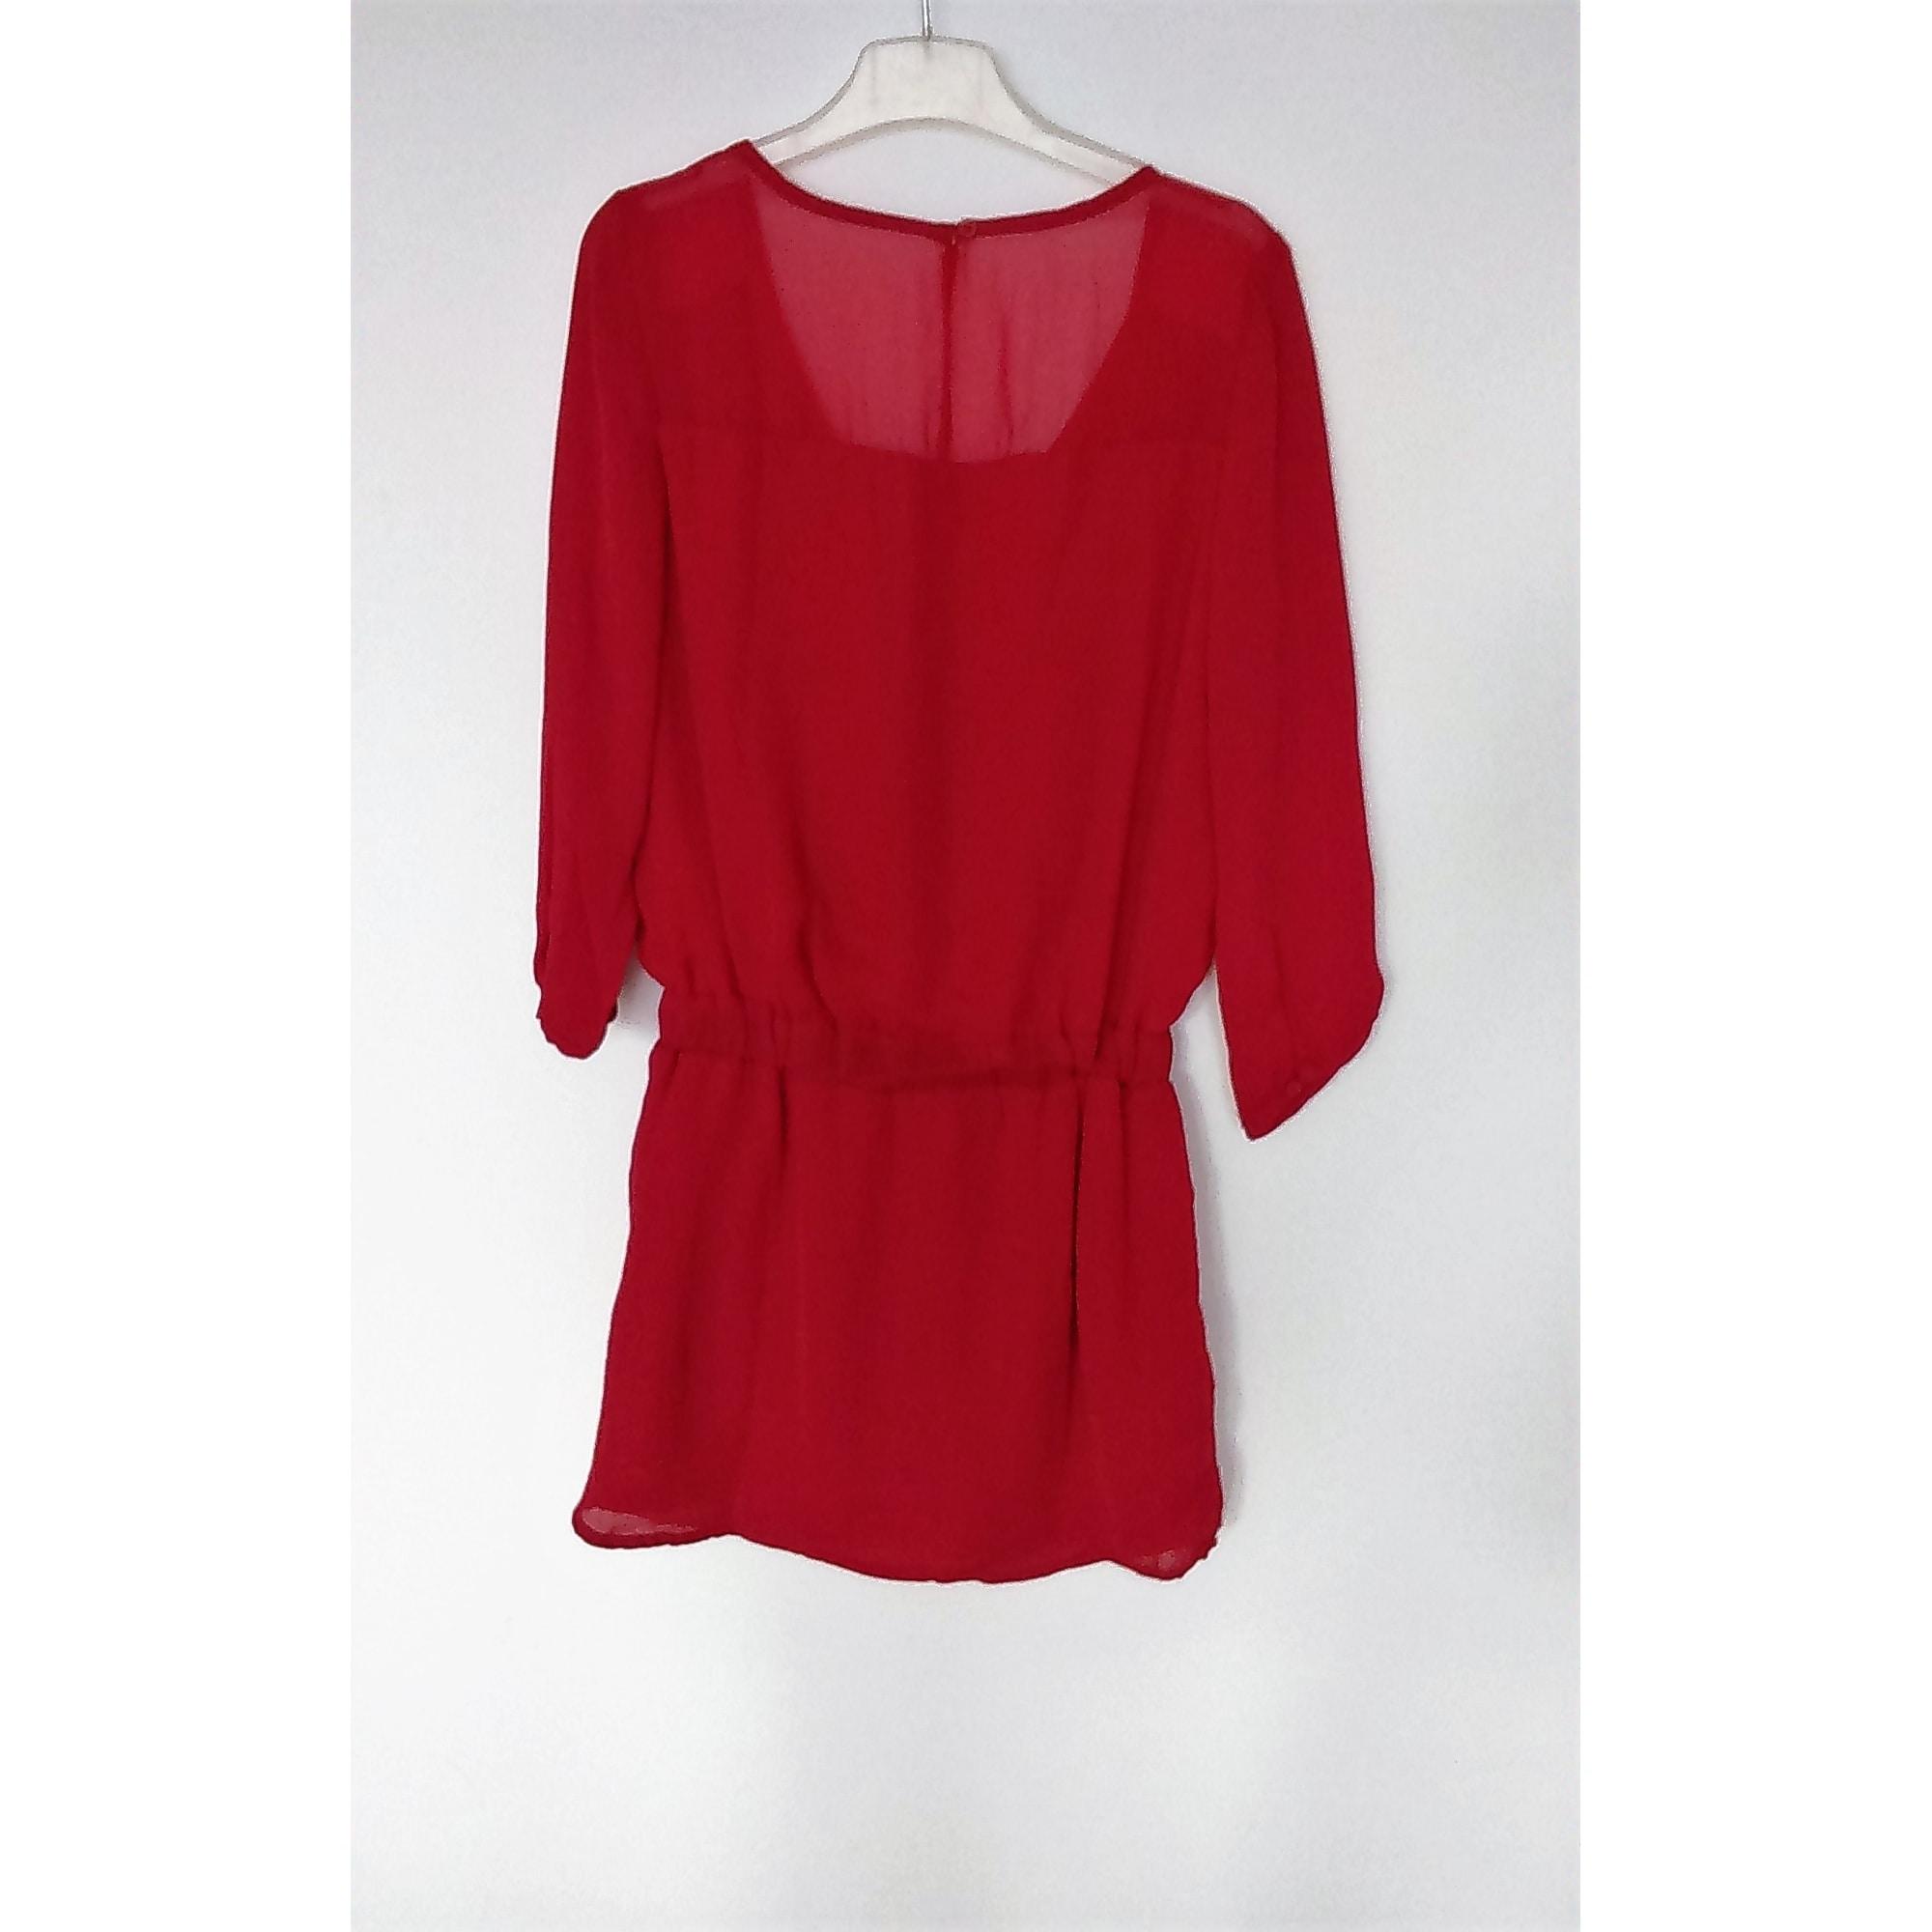 Robe tunique BERSHKA 36 (S, T1) rouge - 6380126